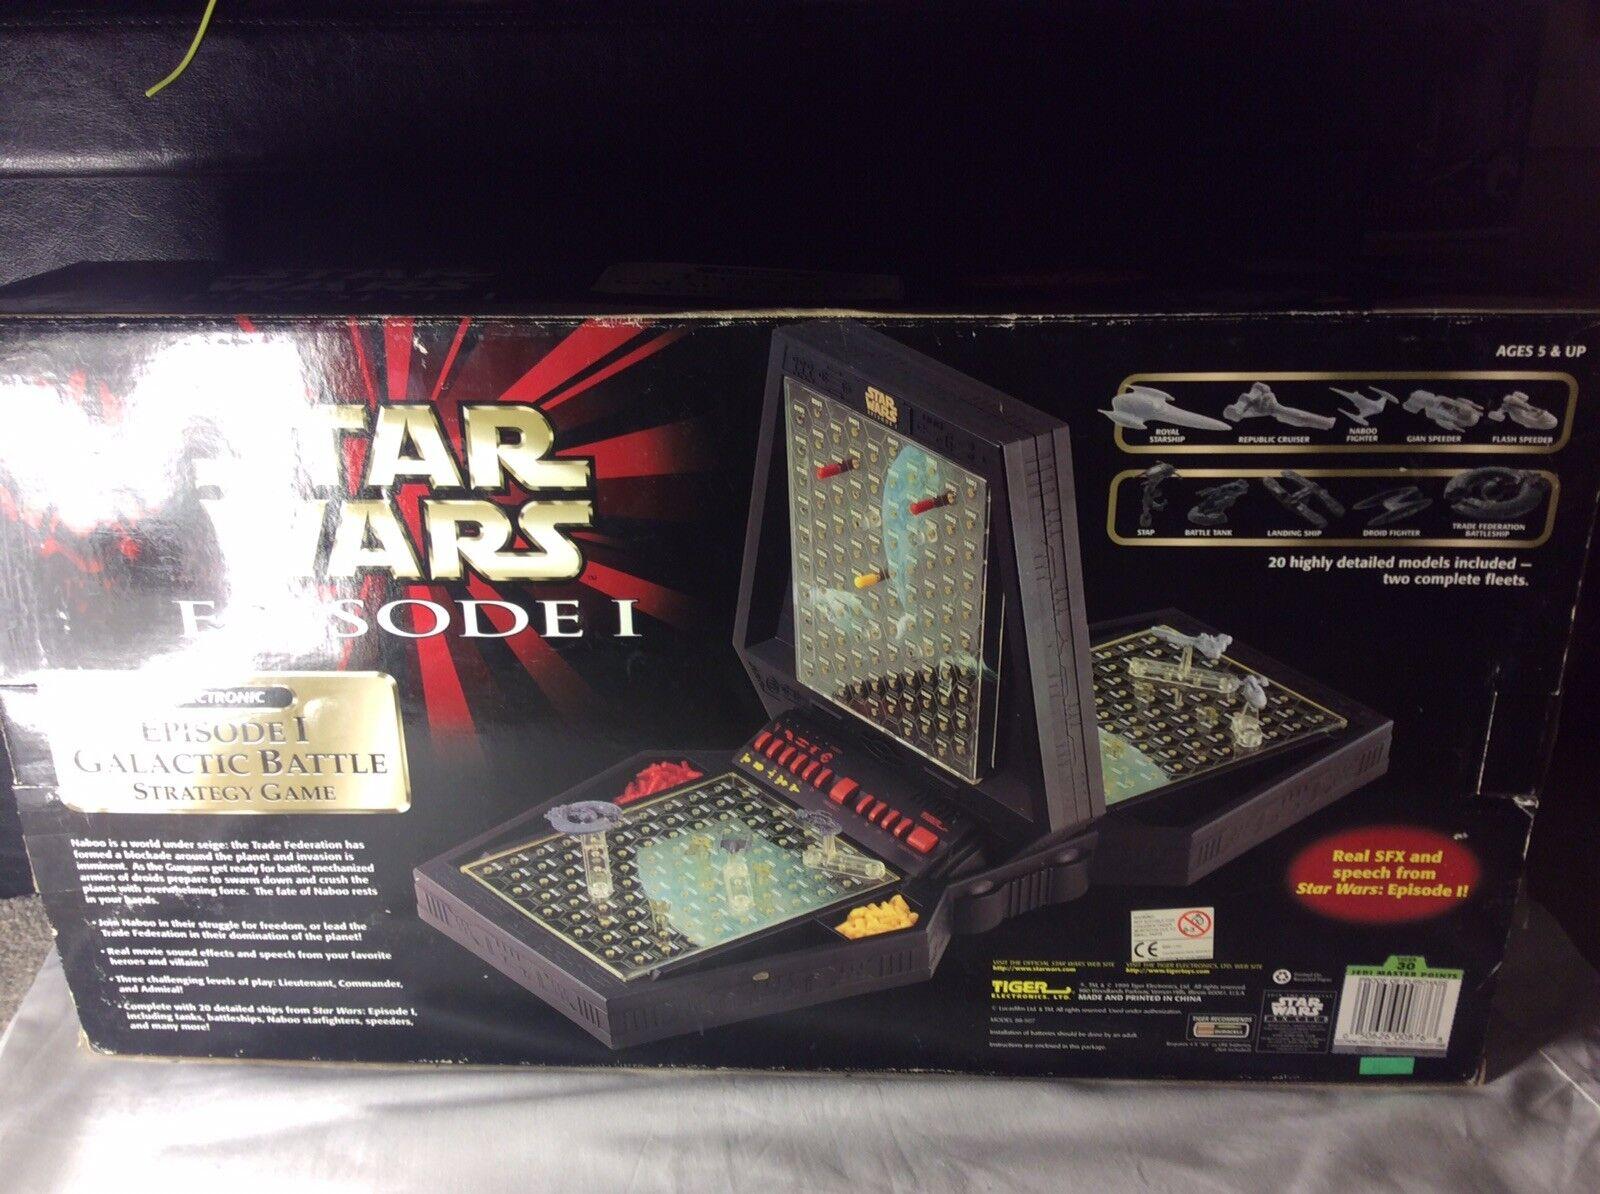 Star Wars Electronic Episode 1 Galactic Battle Battle Battle Strategy Game 1999 New Sealed 62e11d